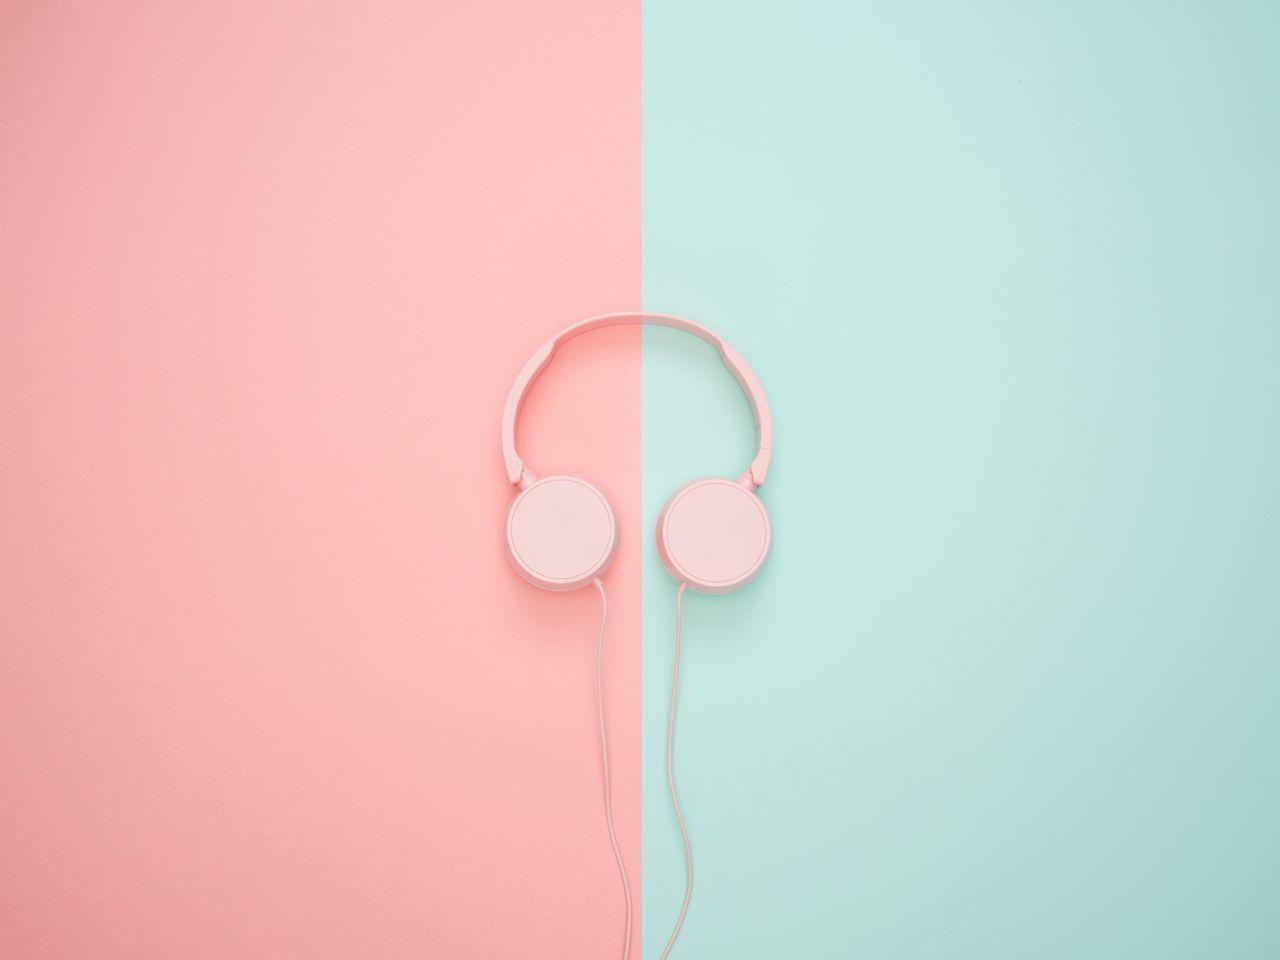 1280x960 Wallpaper headphones, minimalism, pink, pastel